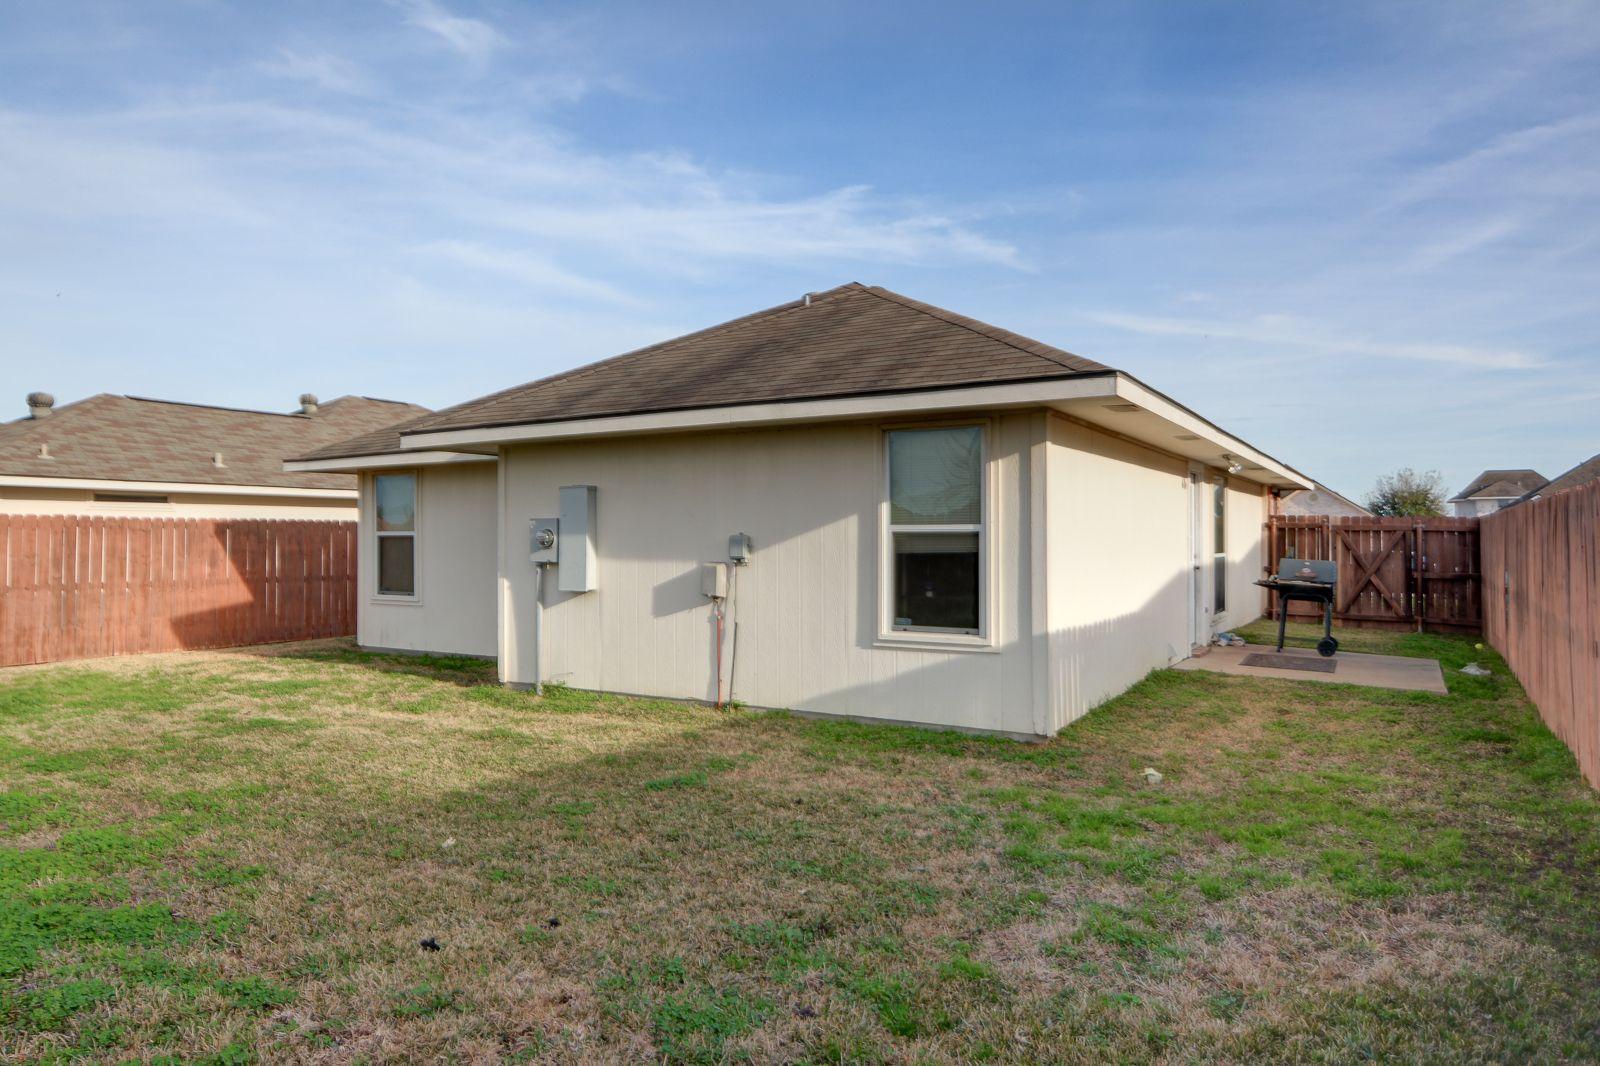 909 Bougainvillea St, College Station, Texas 77845. 4 ...